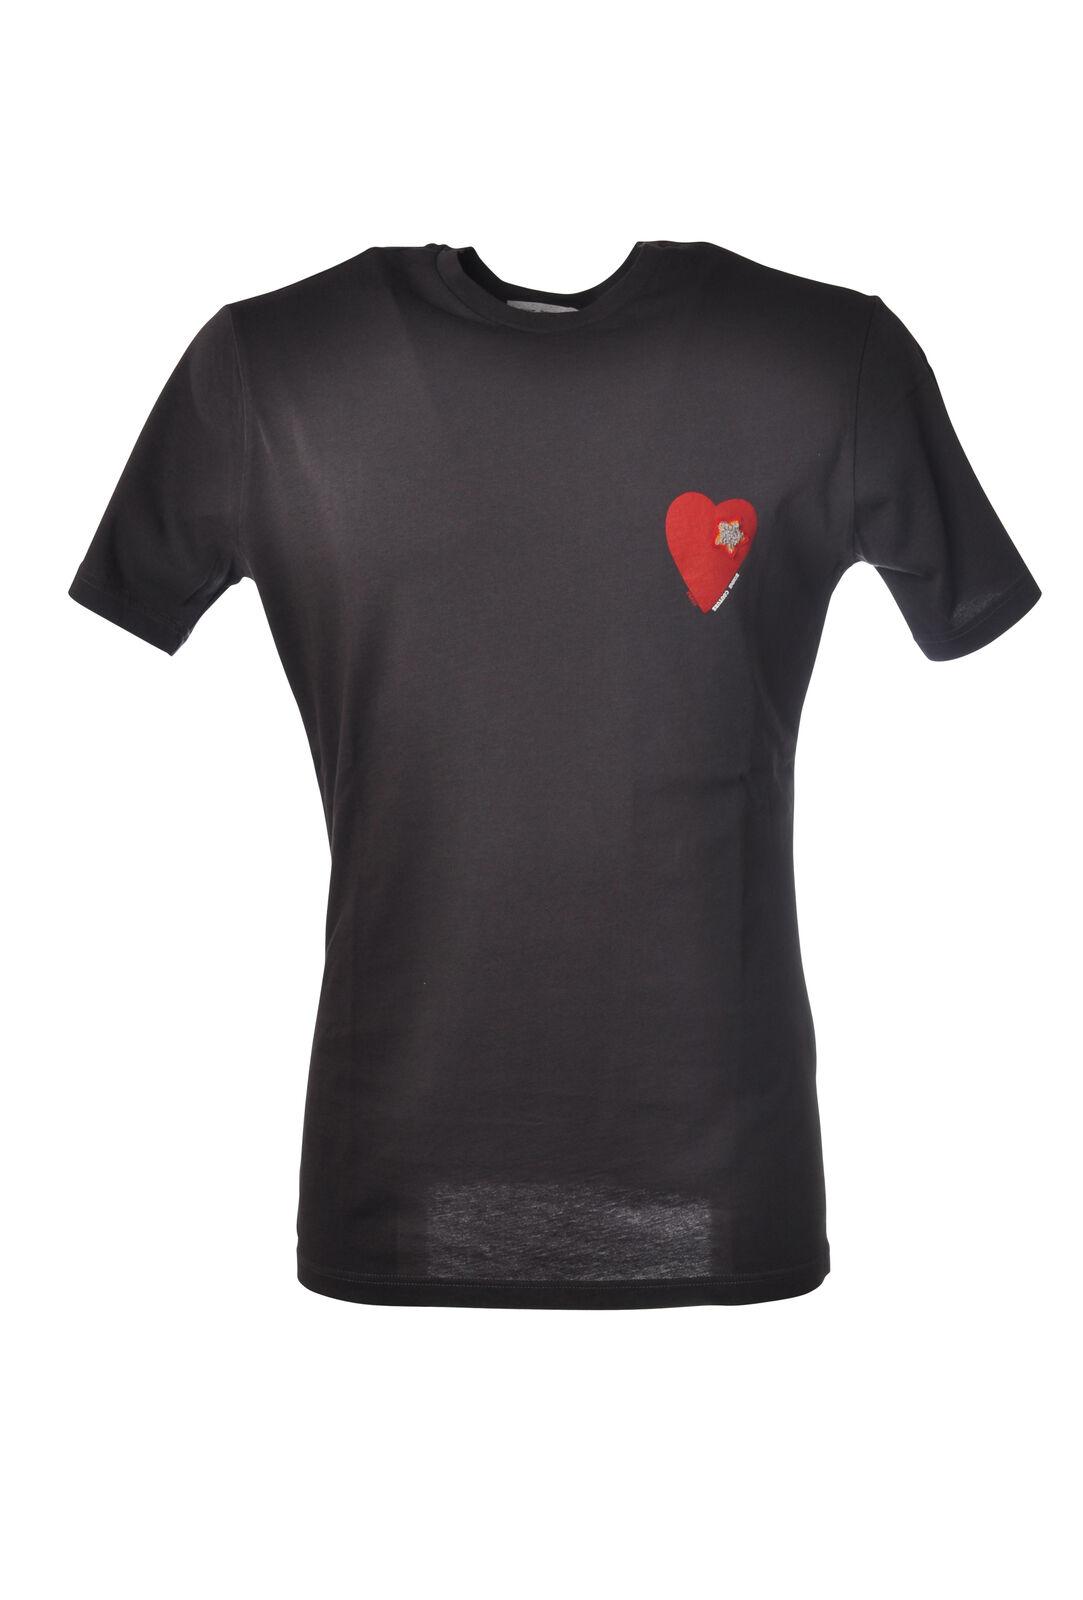 Daniele Alessandrini - Topwear-T-shirts - Mann - Grau - 5288428M185149